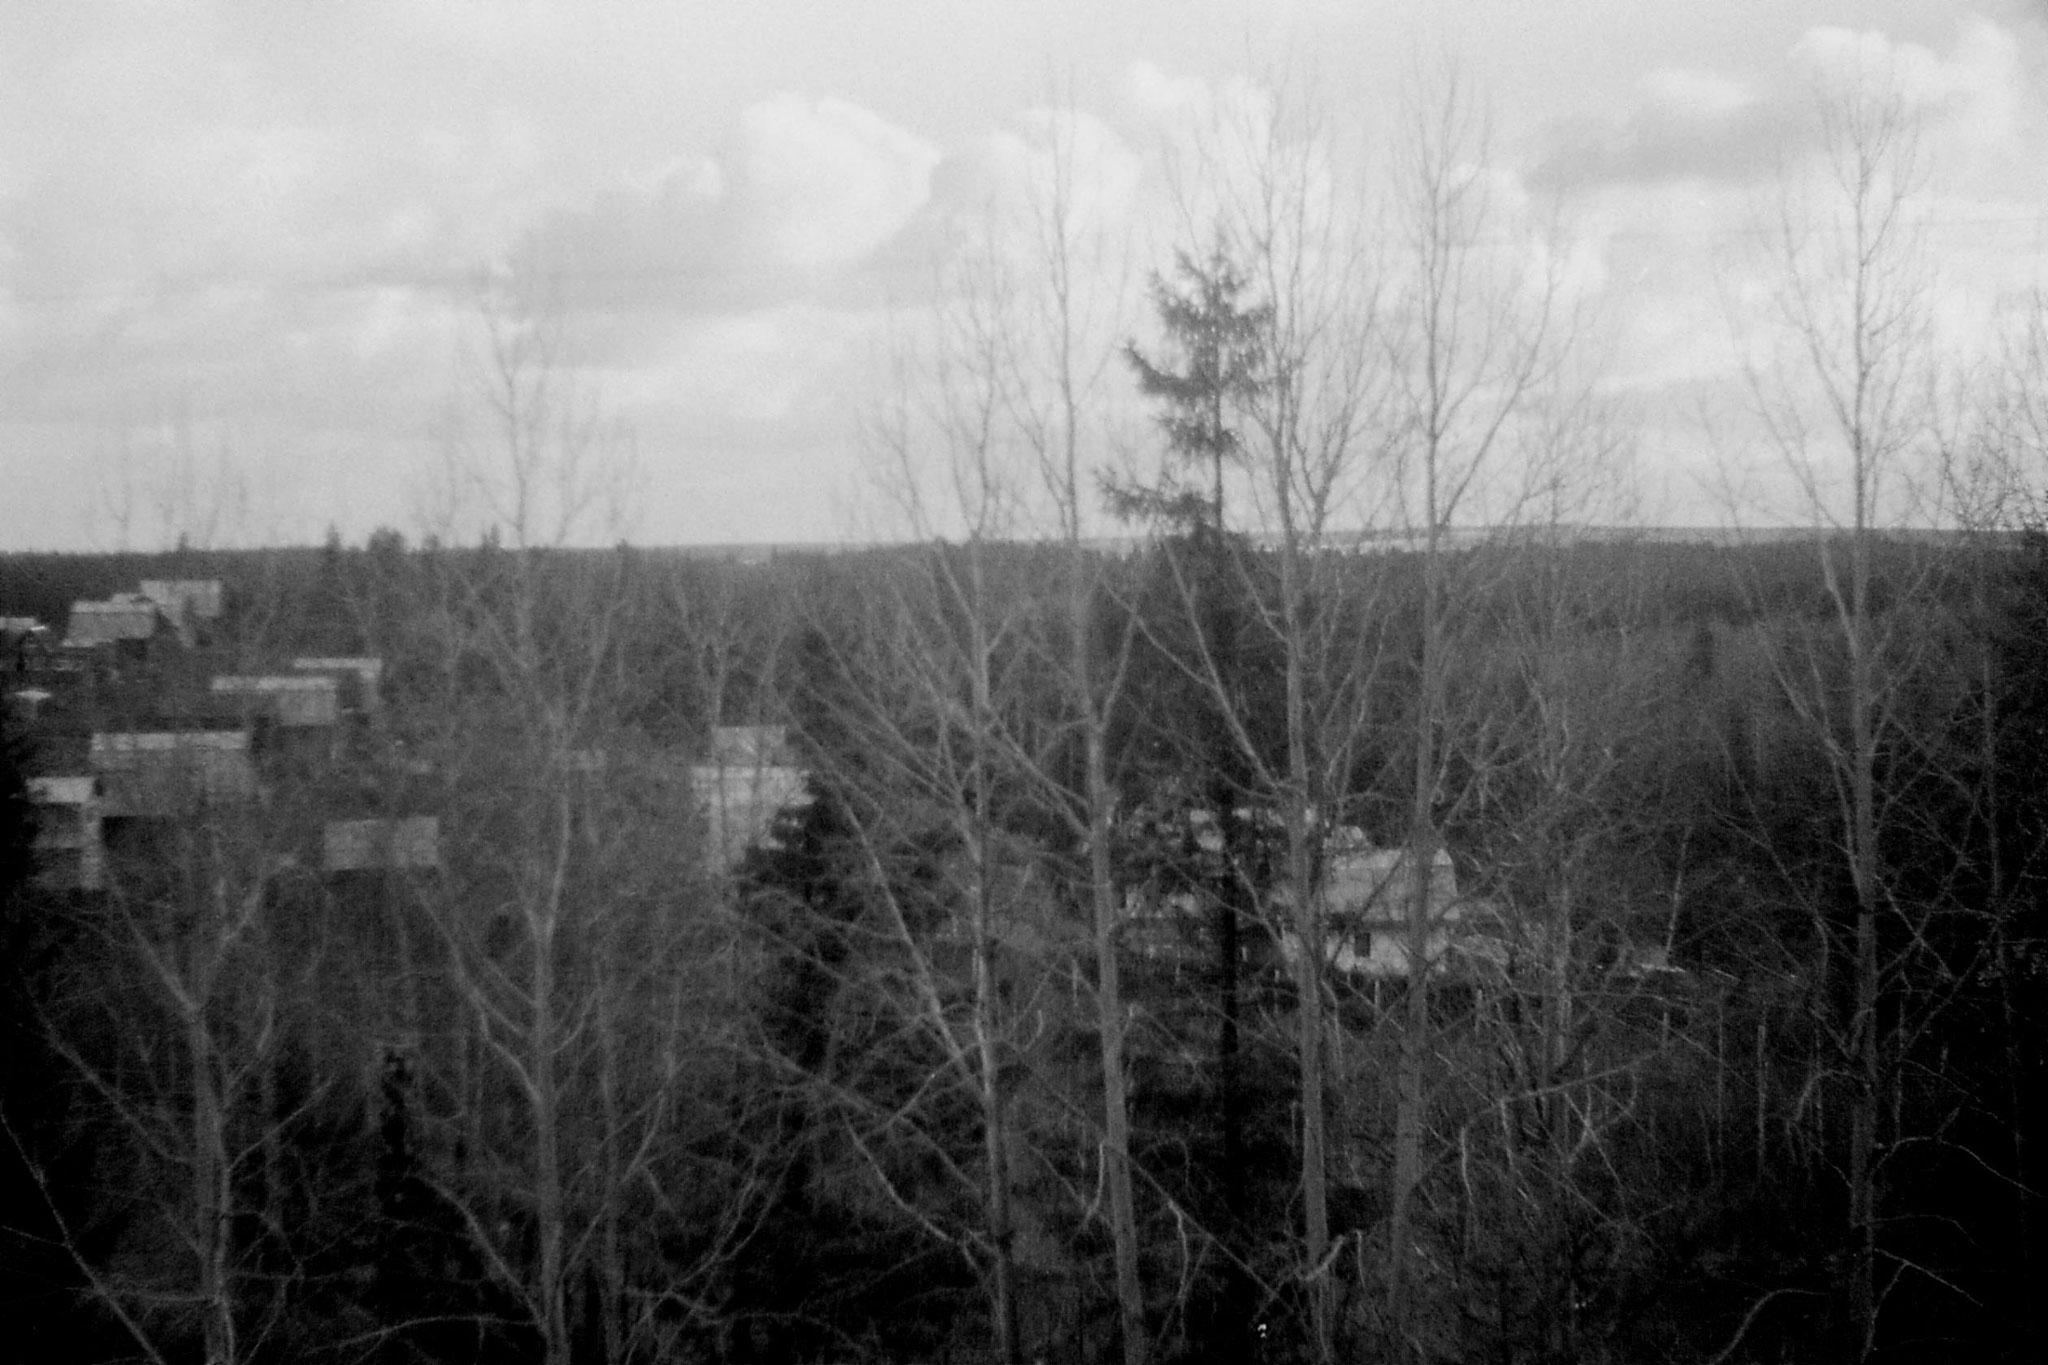 19/10/1988: 19: from Siberian Express between Balezino and Perm